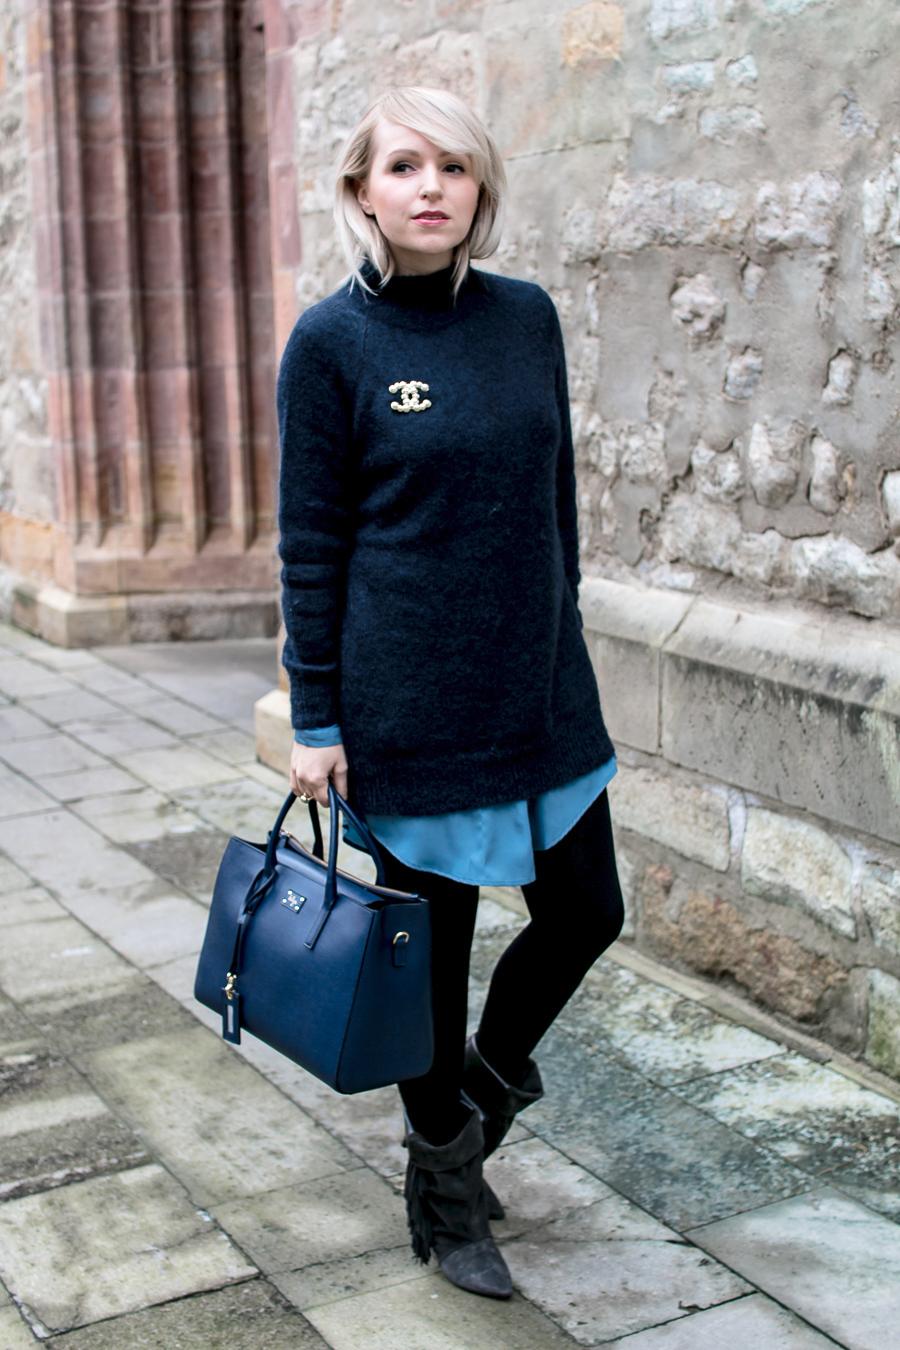 wearing colour blue